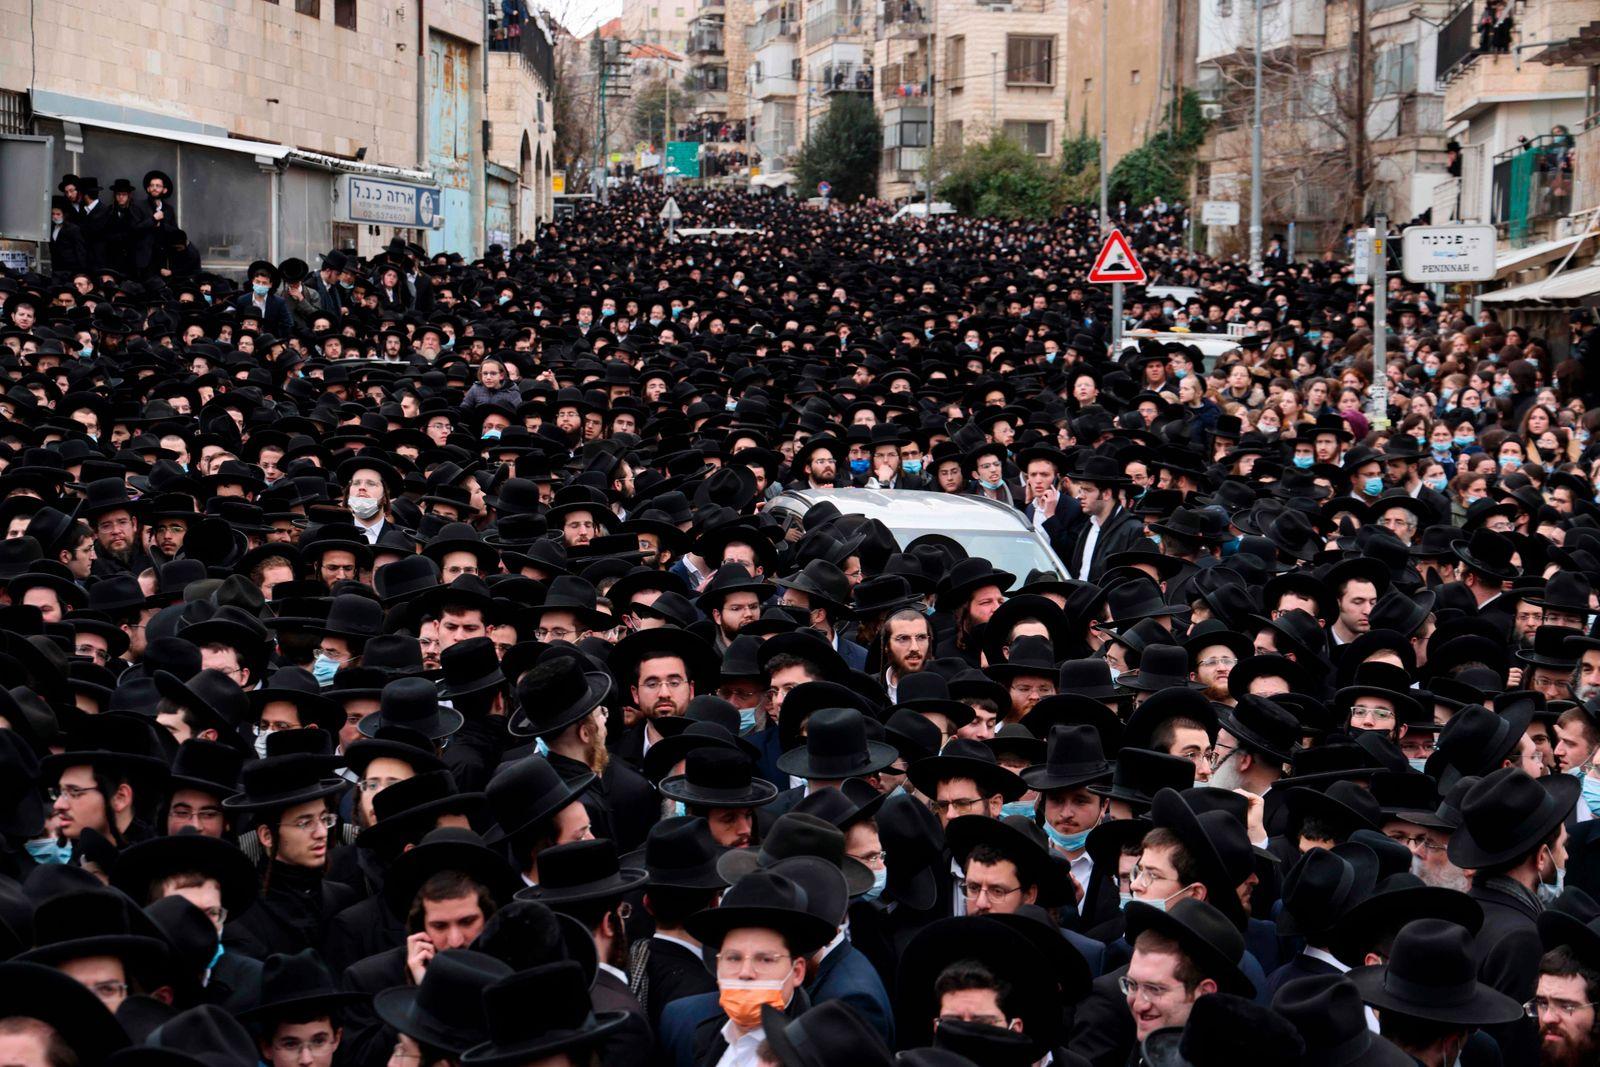 TOPSHOT-ISRAEL-HEALTH-VIRUS-RABBI-DEATH